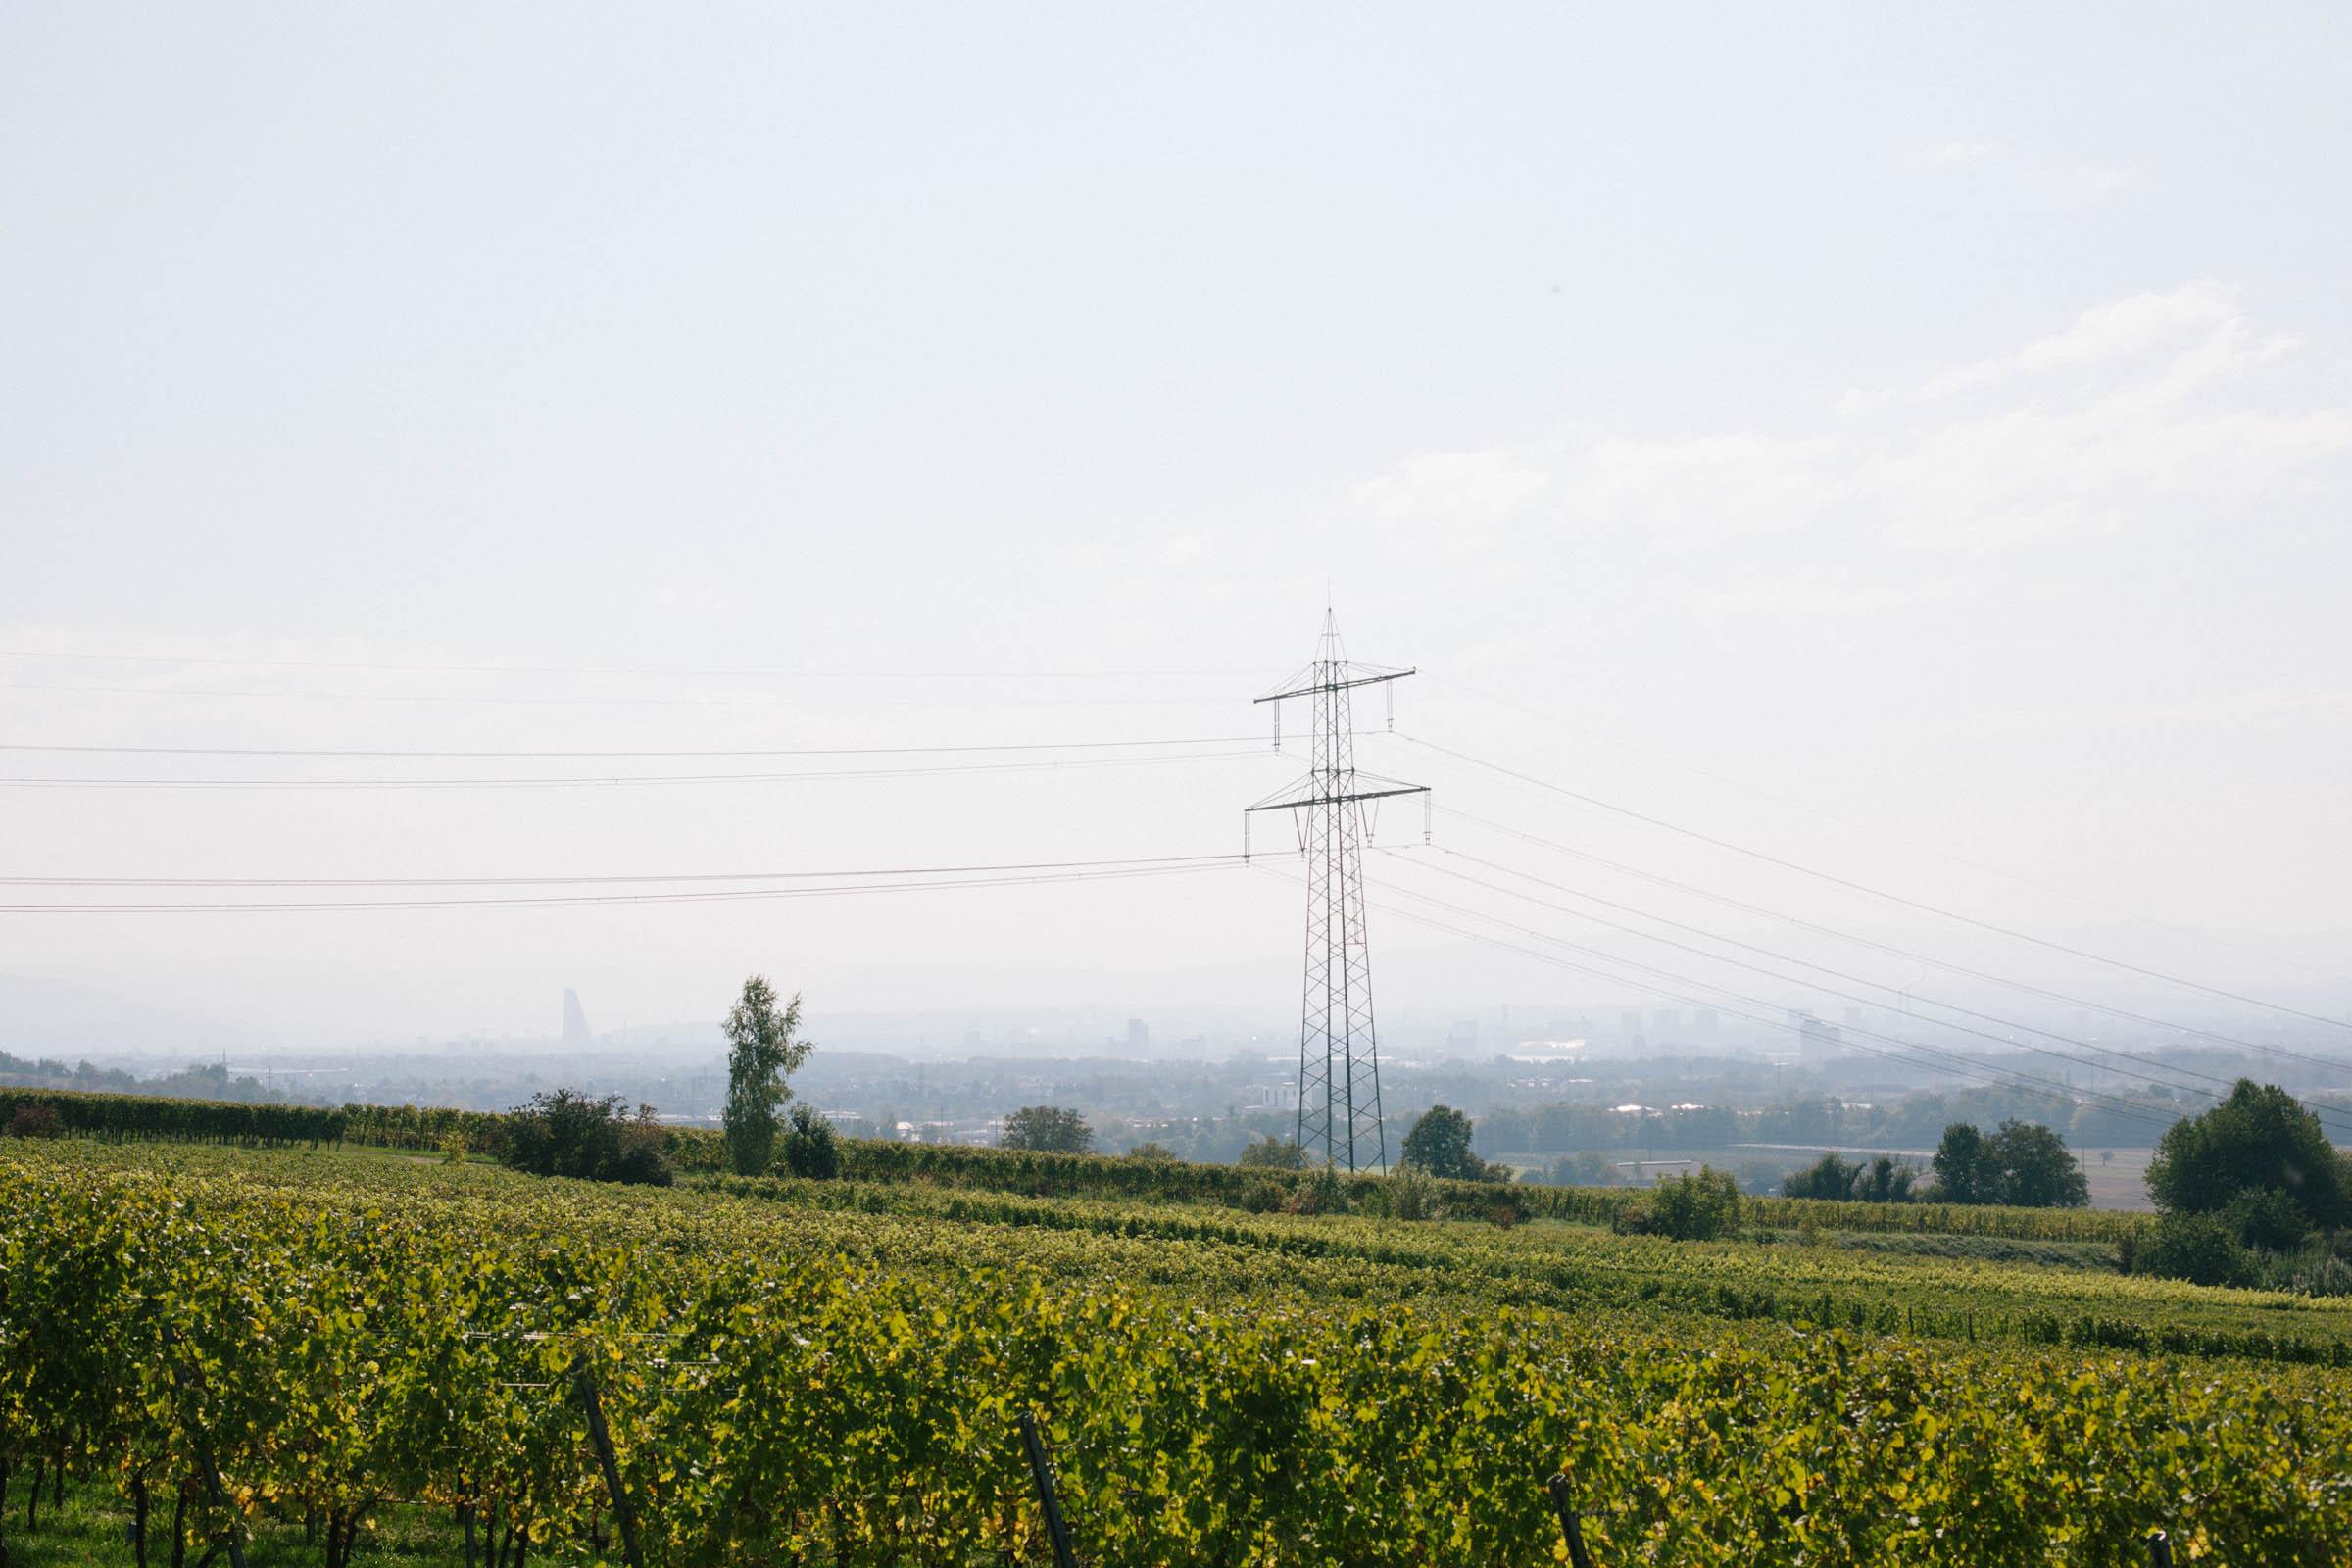 The vineyards in Binzen and the Basel skyline in the haze behind.